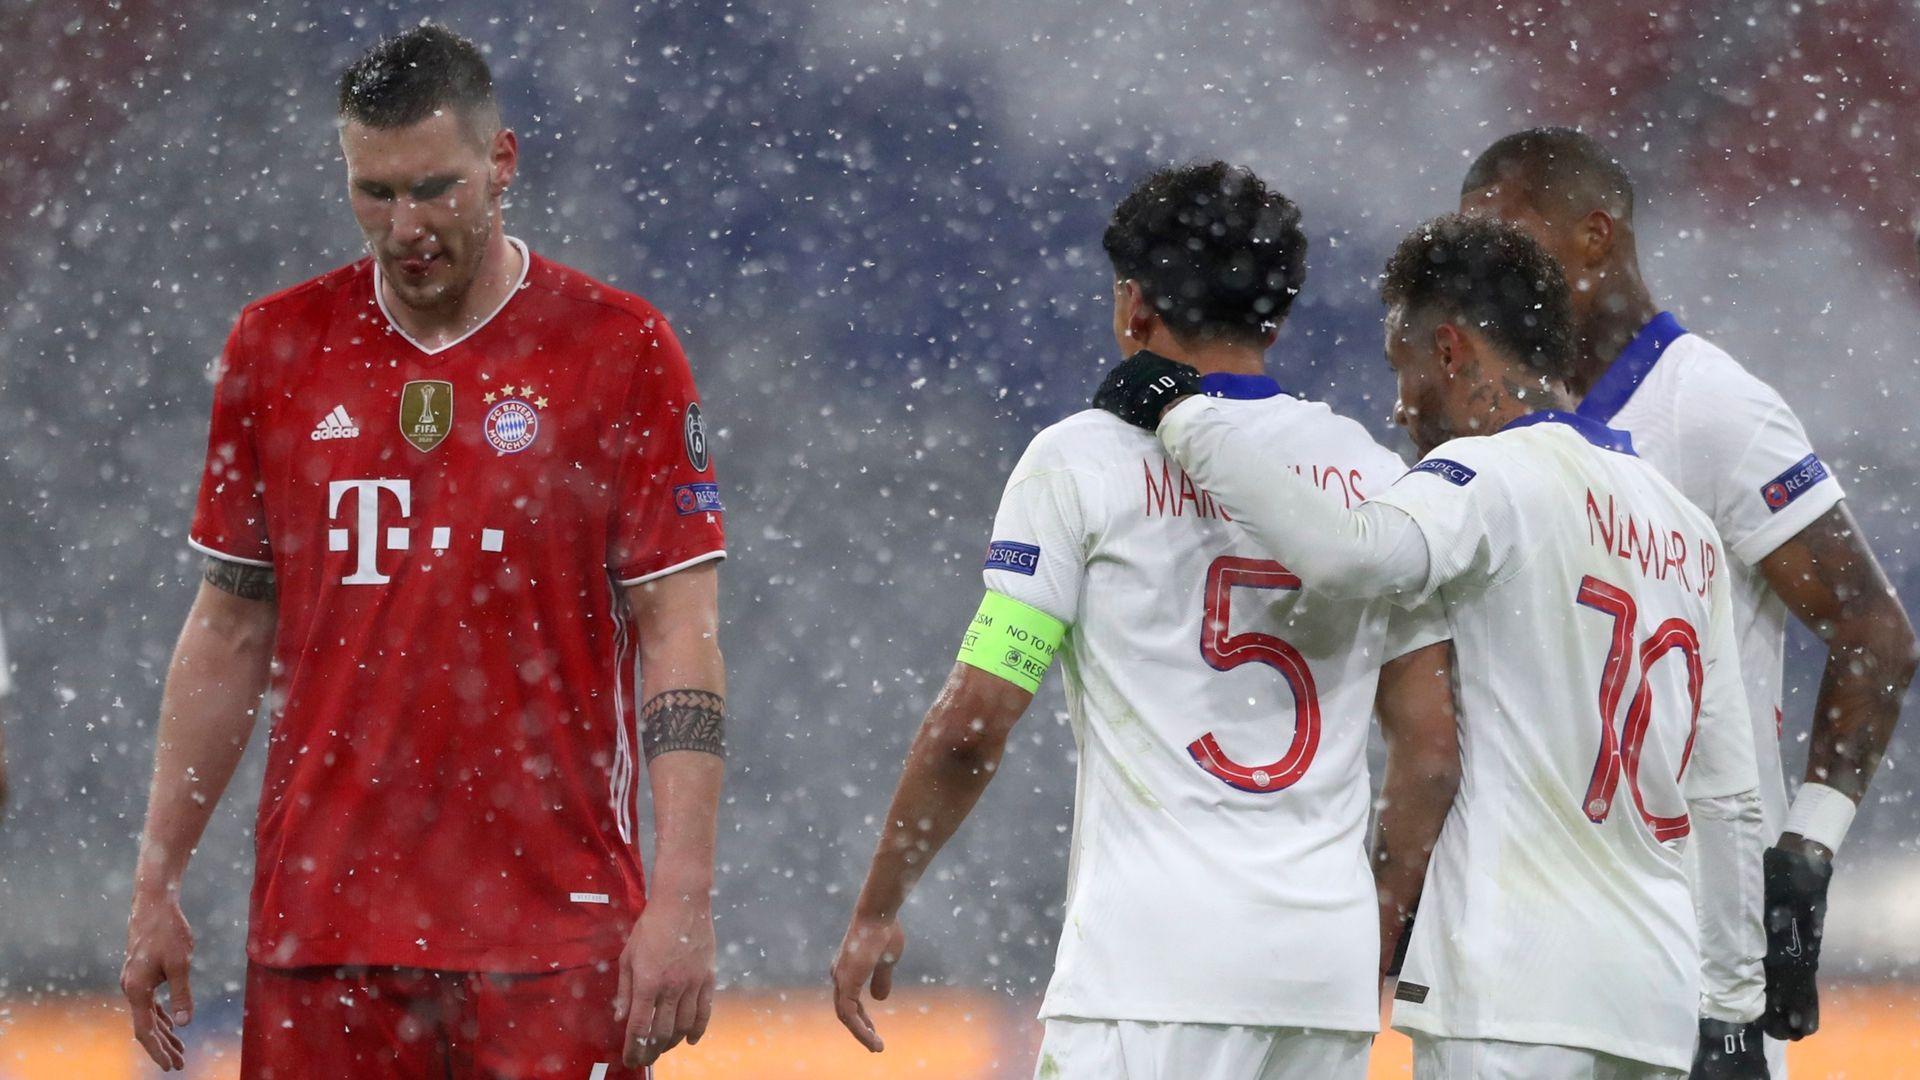 Poch: Players sacrificed | Mbappe: Poch gave us confidence